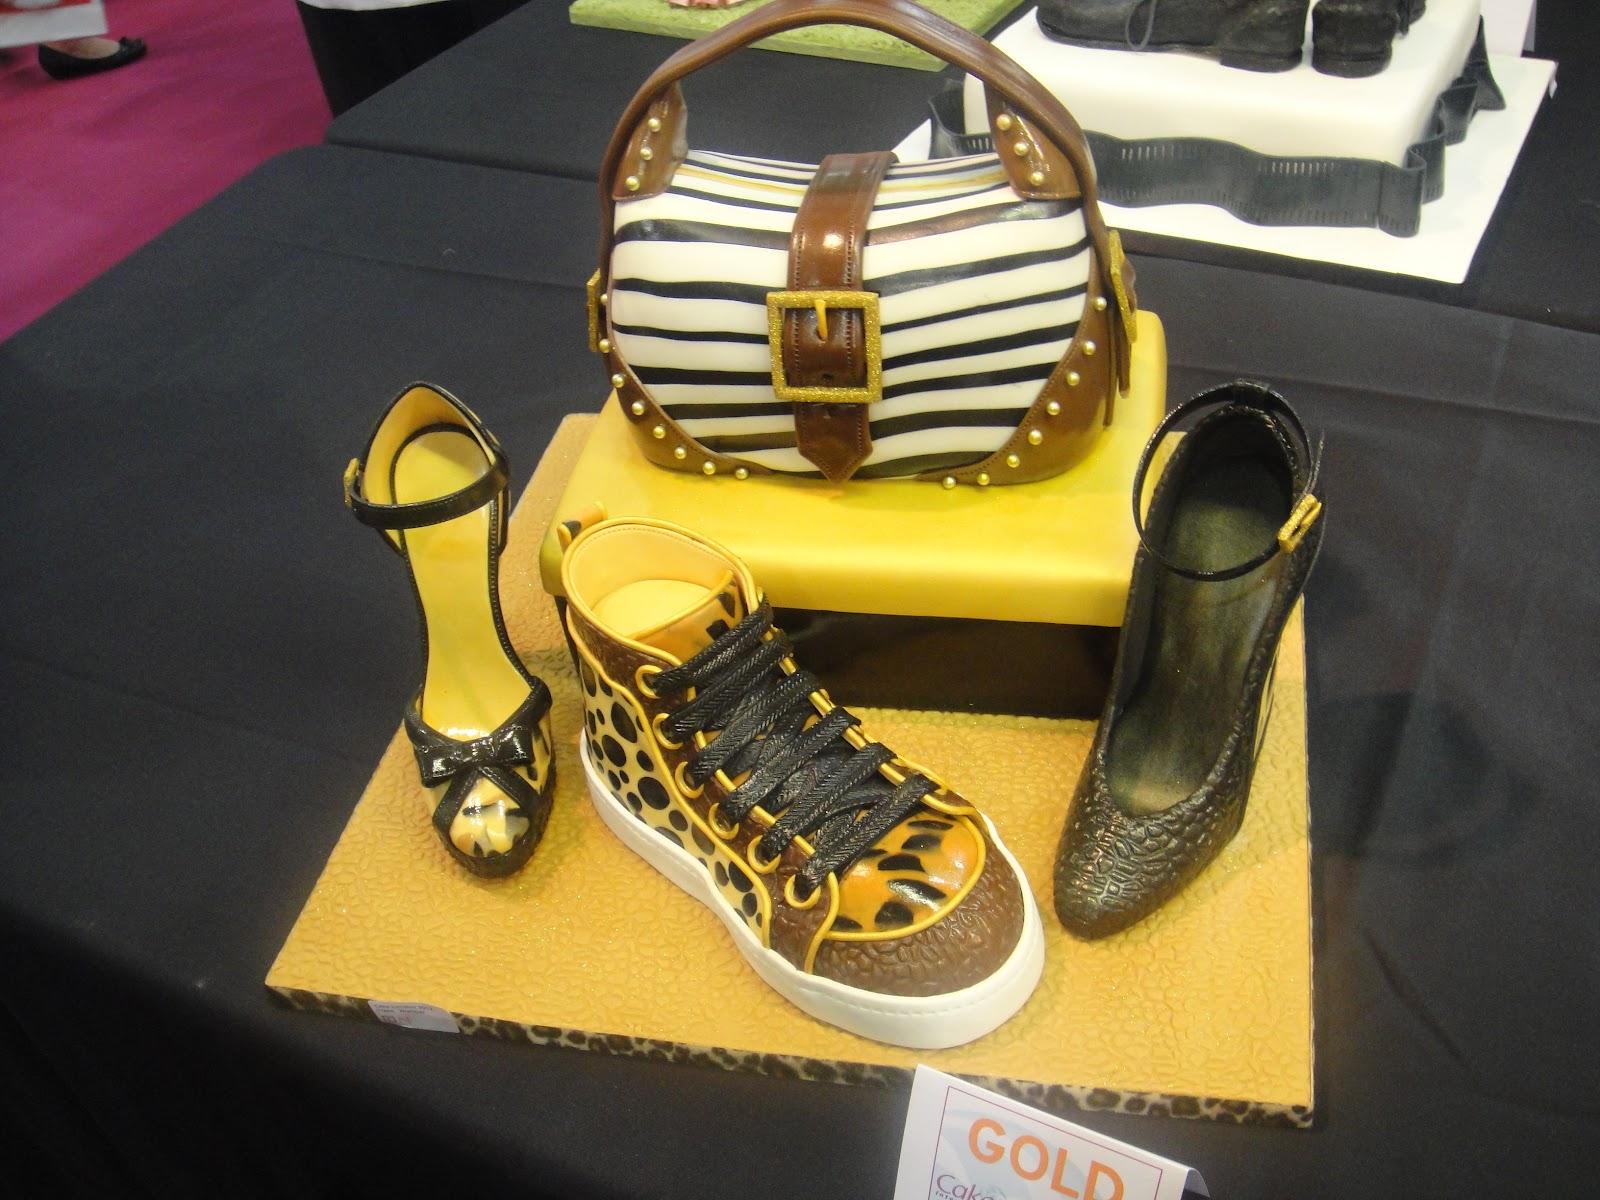 Cake Making Classes Wolverhampton : The more than occasional baker: Cake International 2012